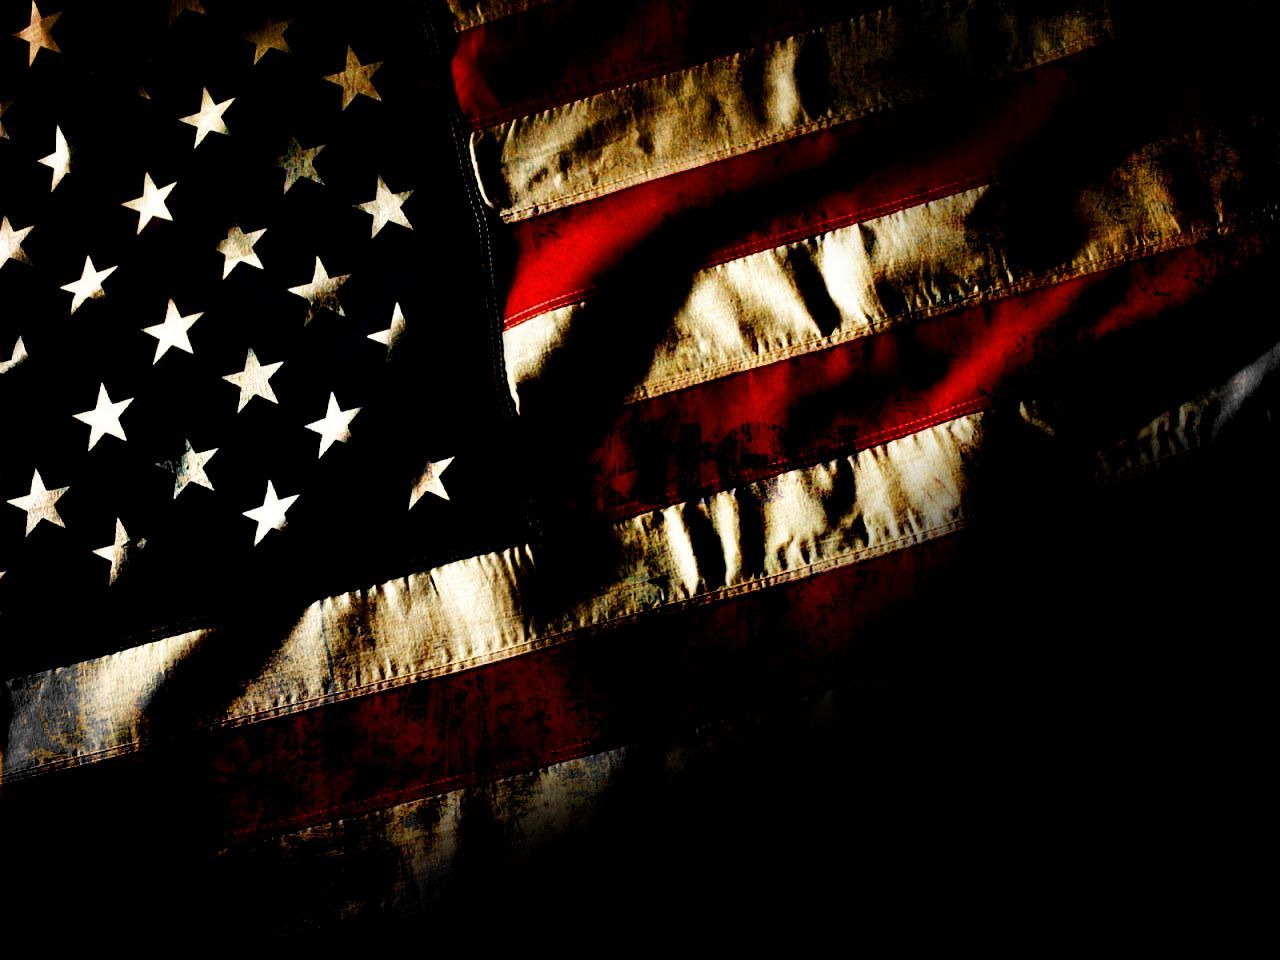 Hd wallpaper usa flag - American Flag Photos